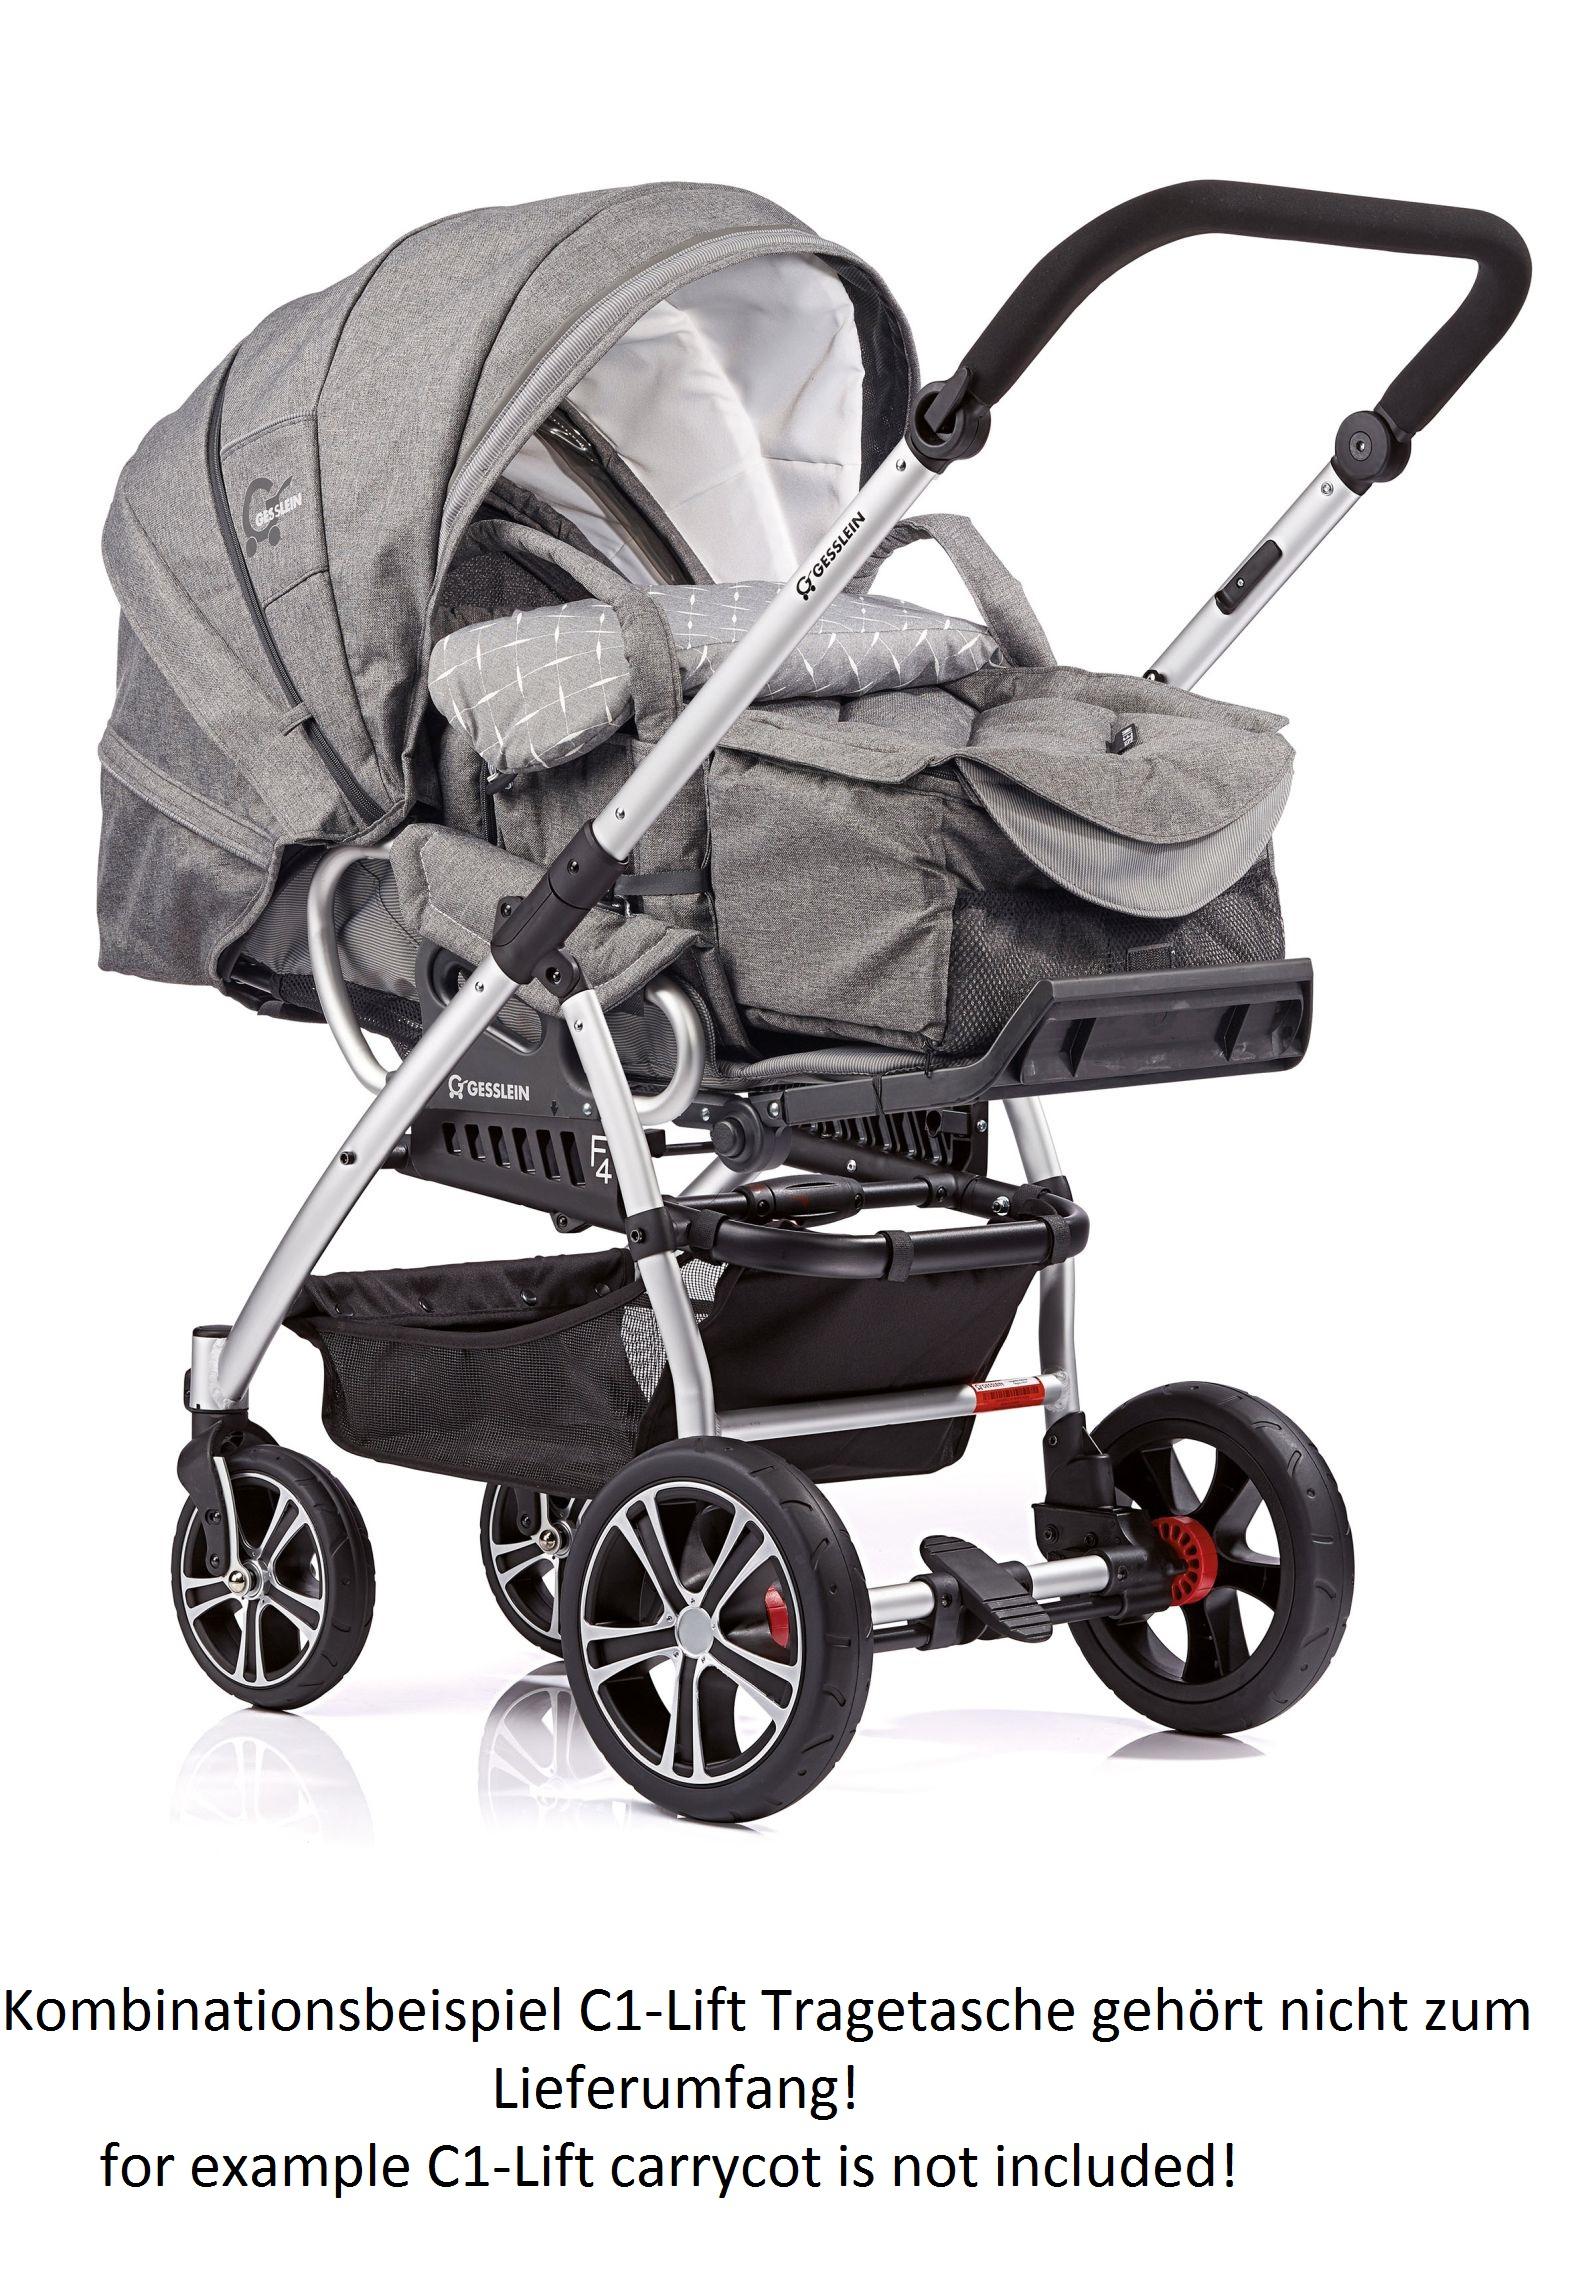 gesslein stroller f4 air 2018 866866 buy at kidsroom strollers. Black Bedroom Furniture Sets. Home Design Ideas